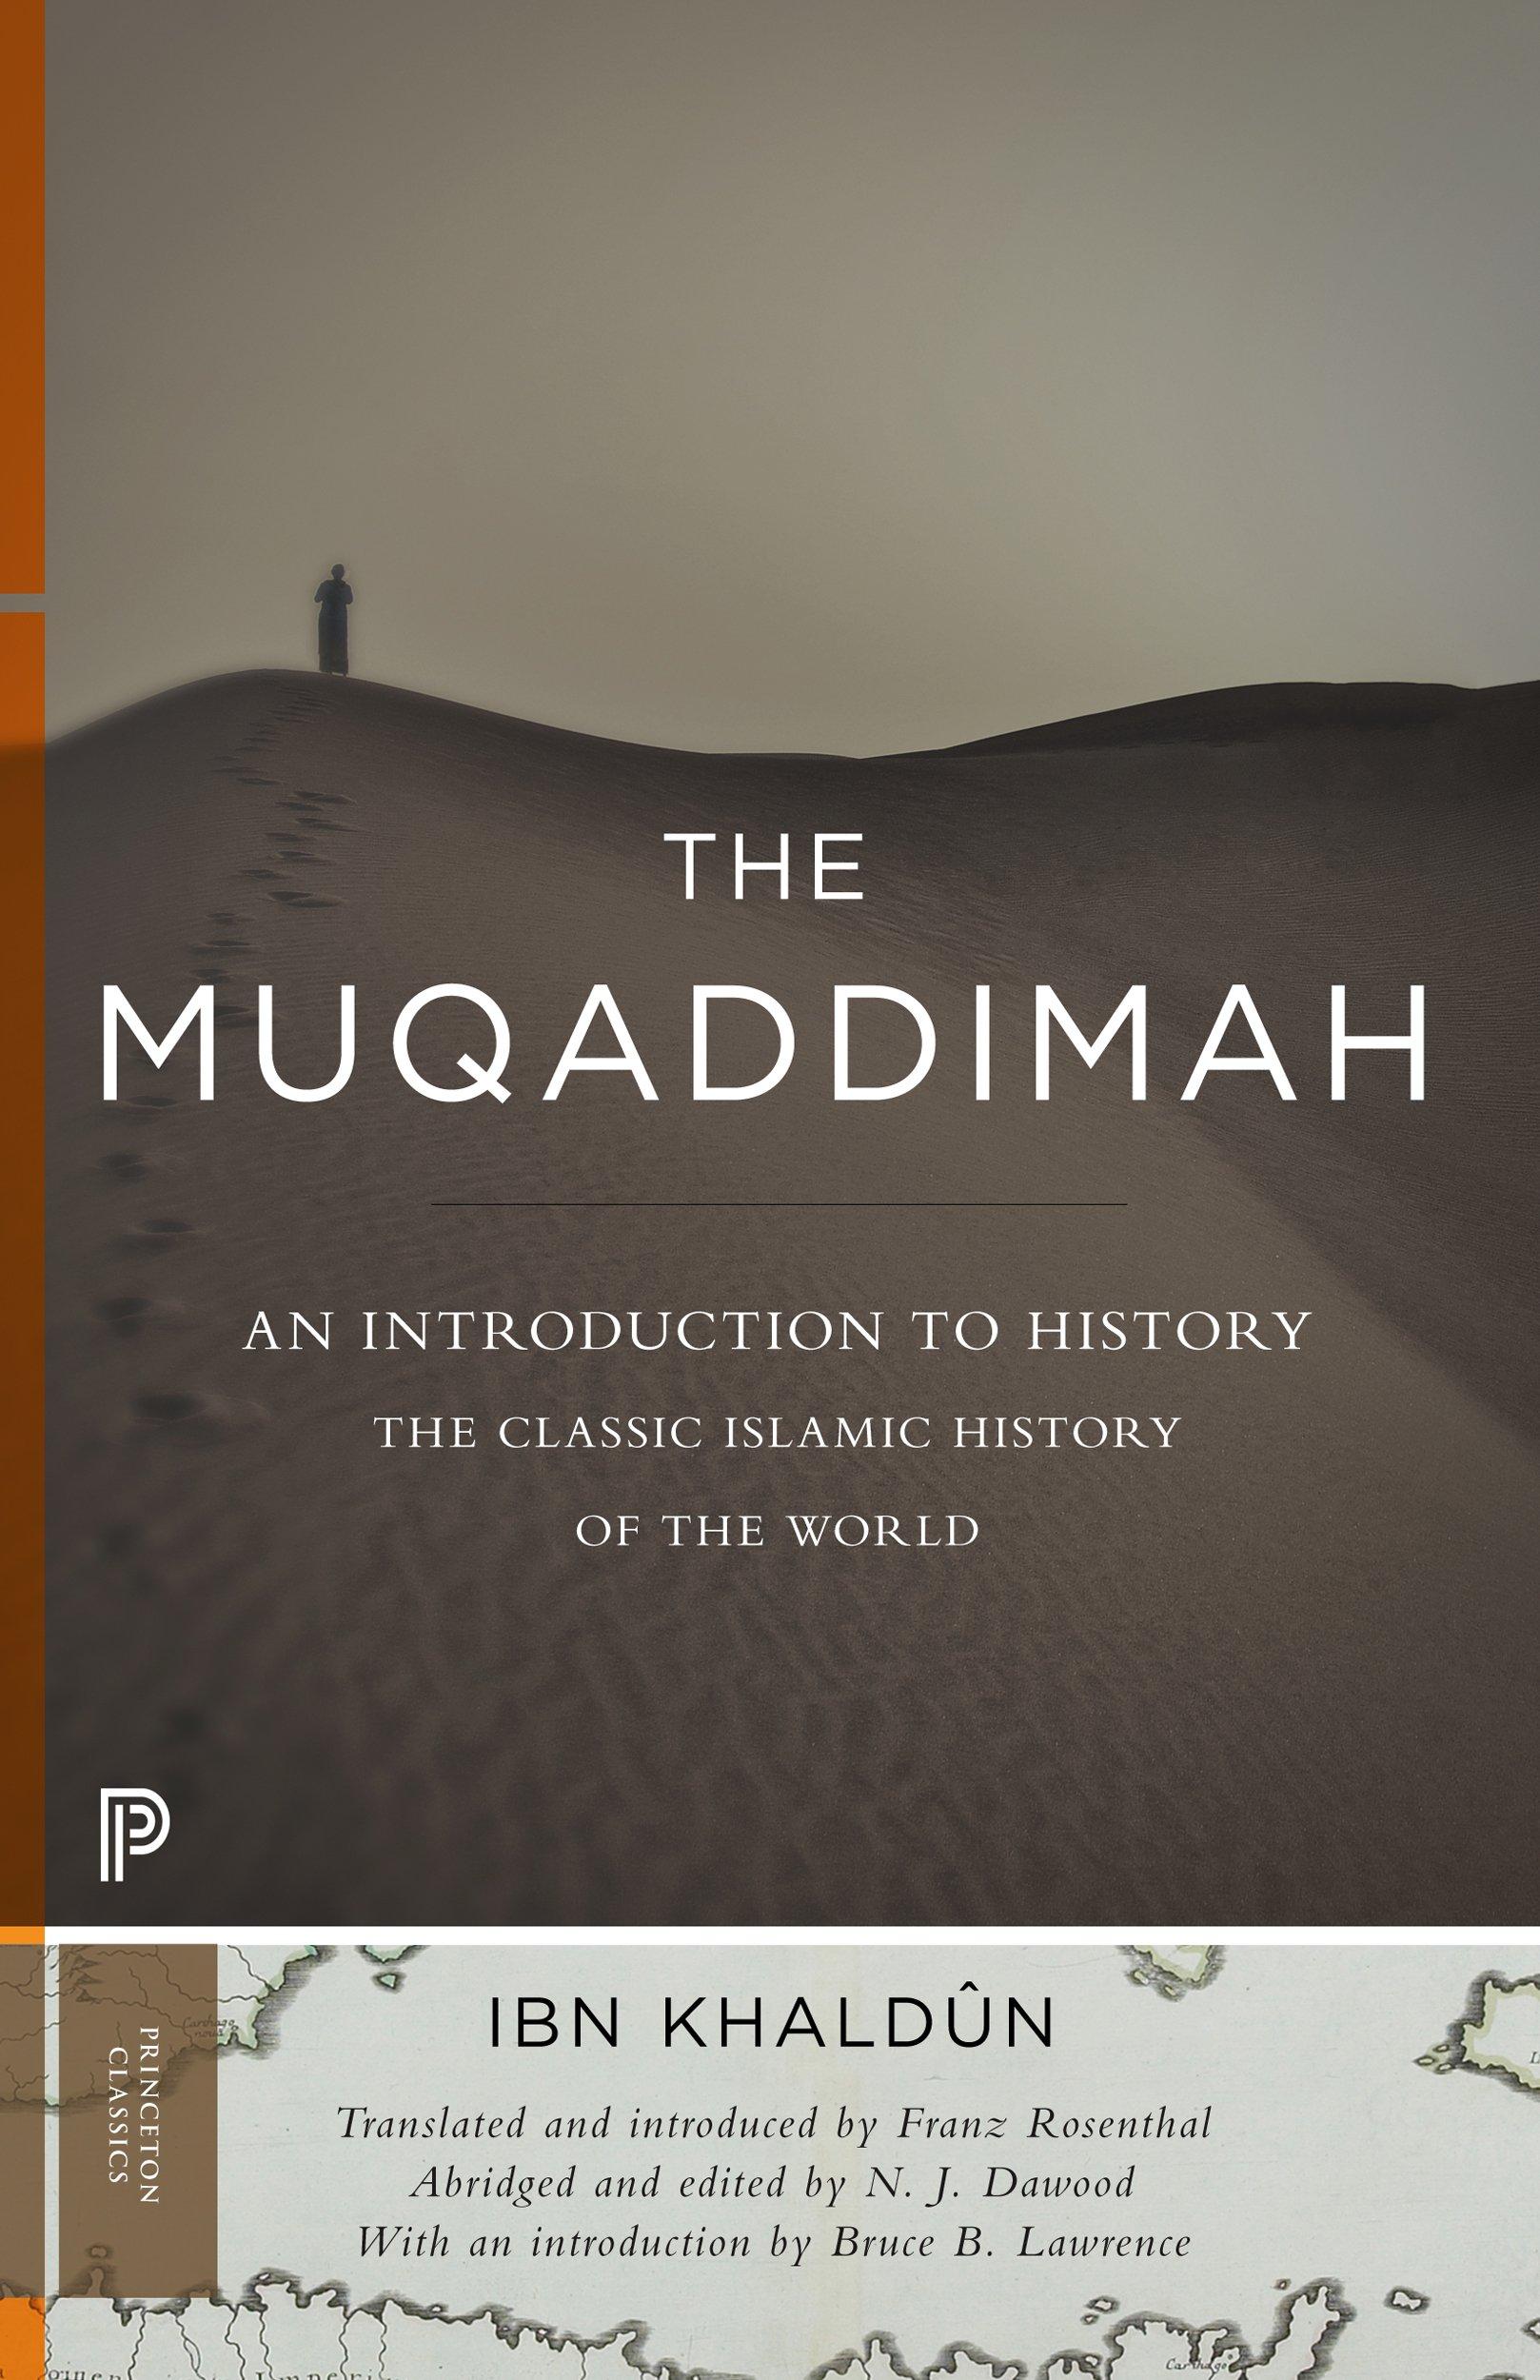 the-muqaddimah-book-cover-ibn-khaldun